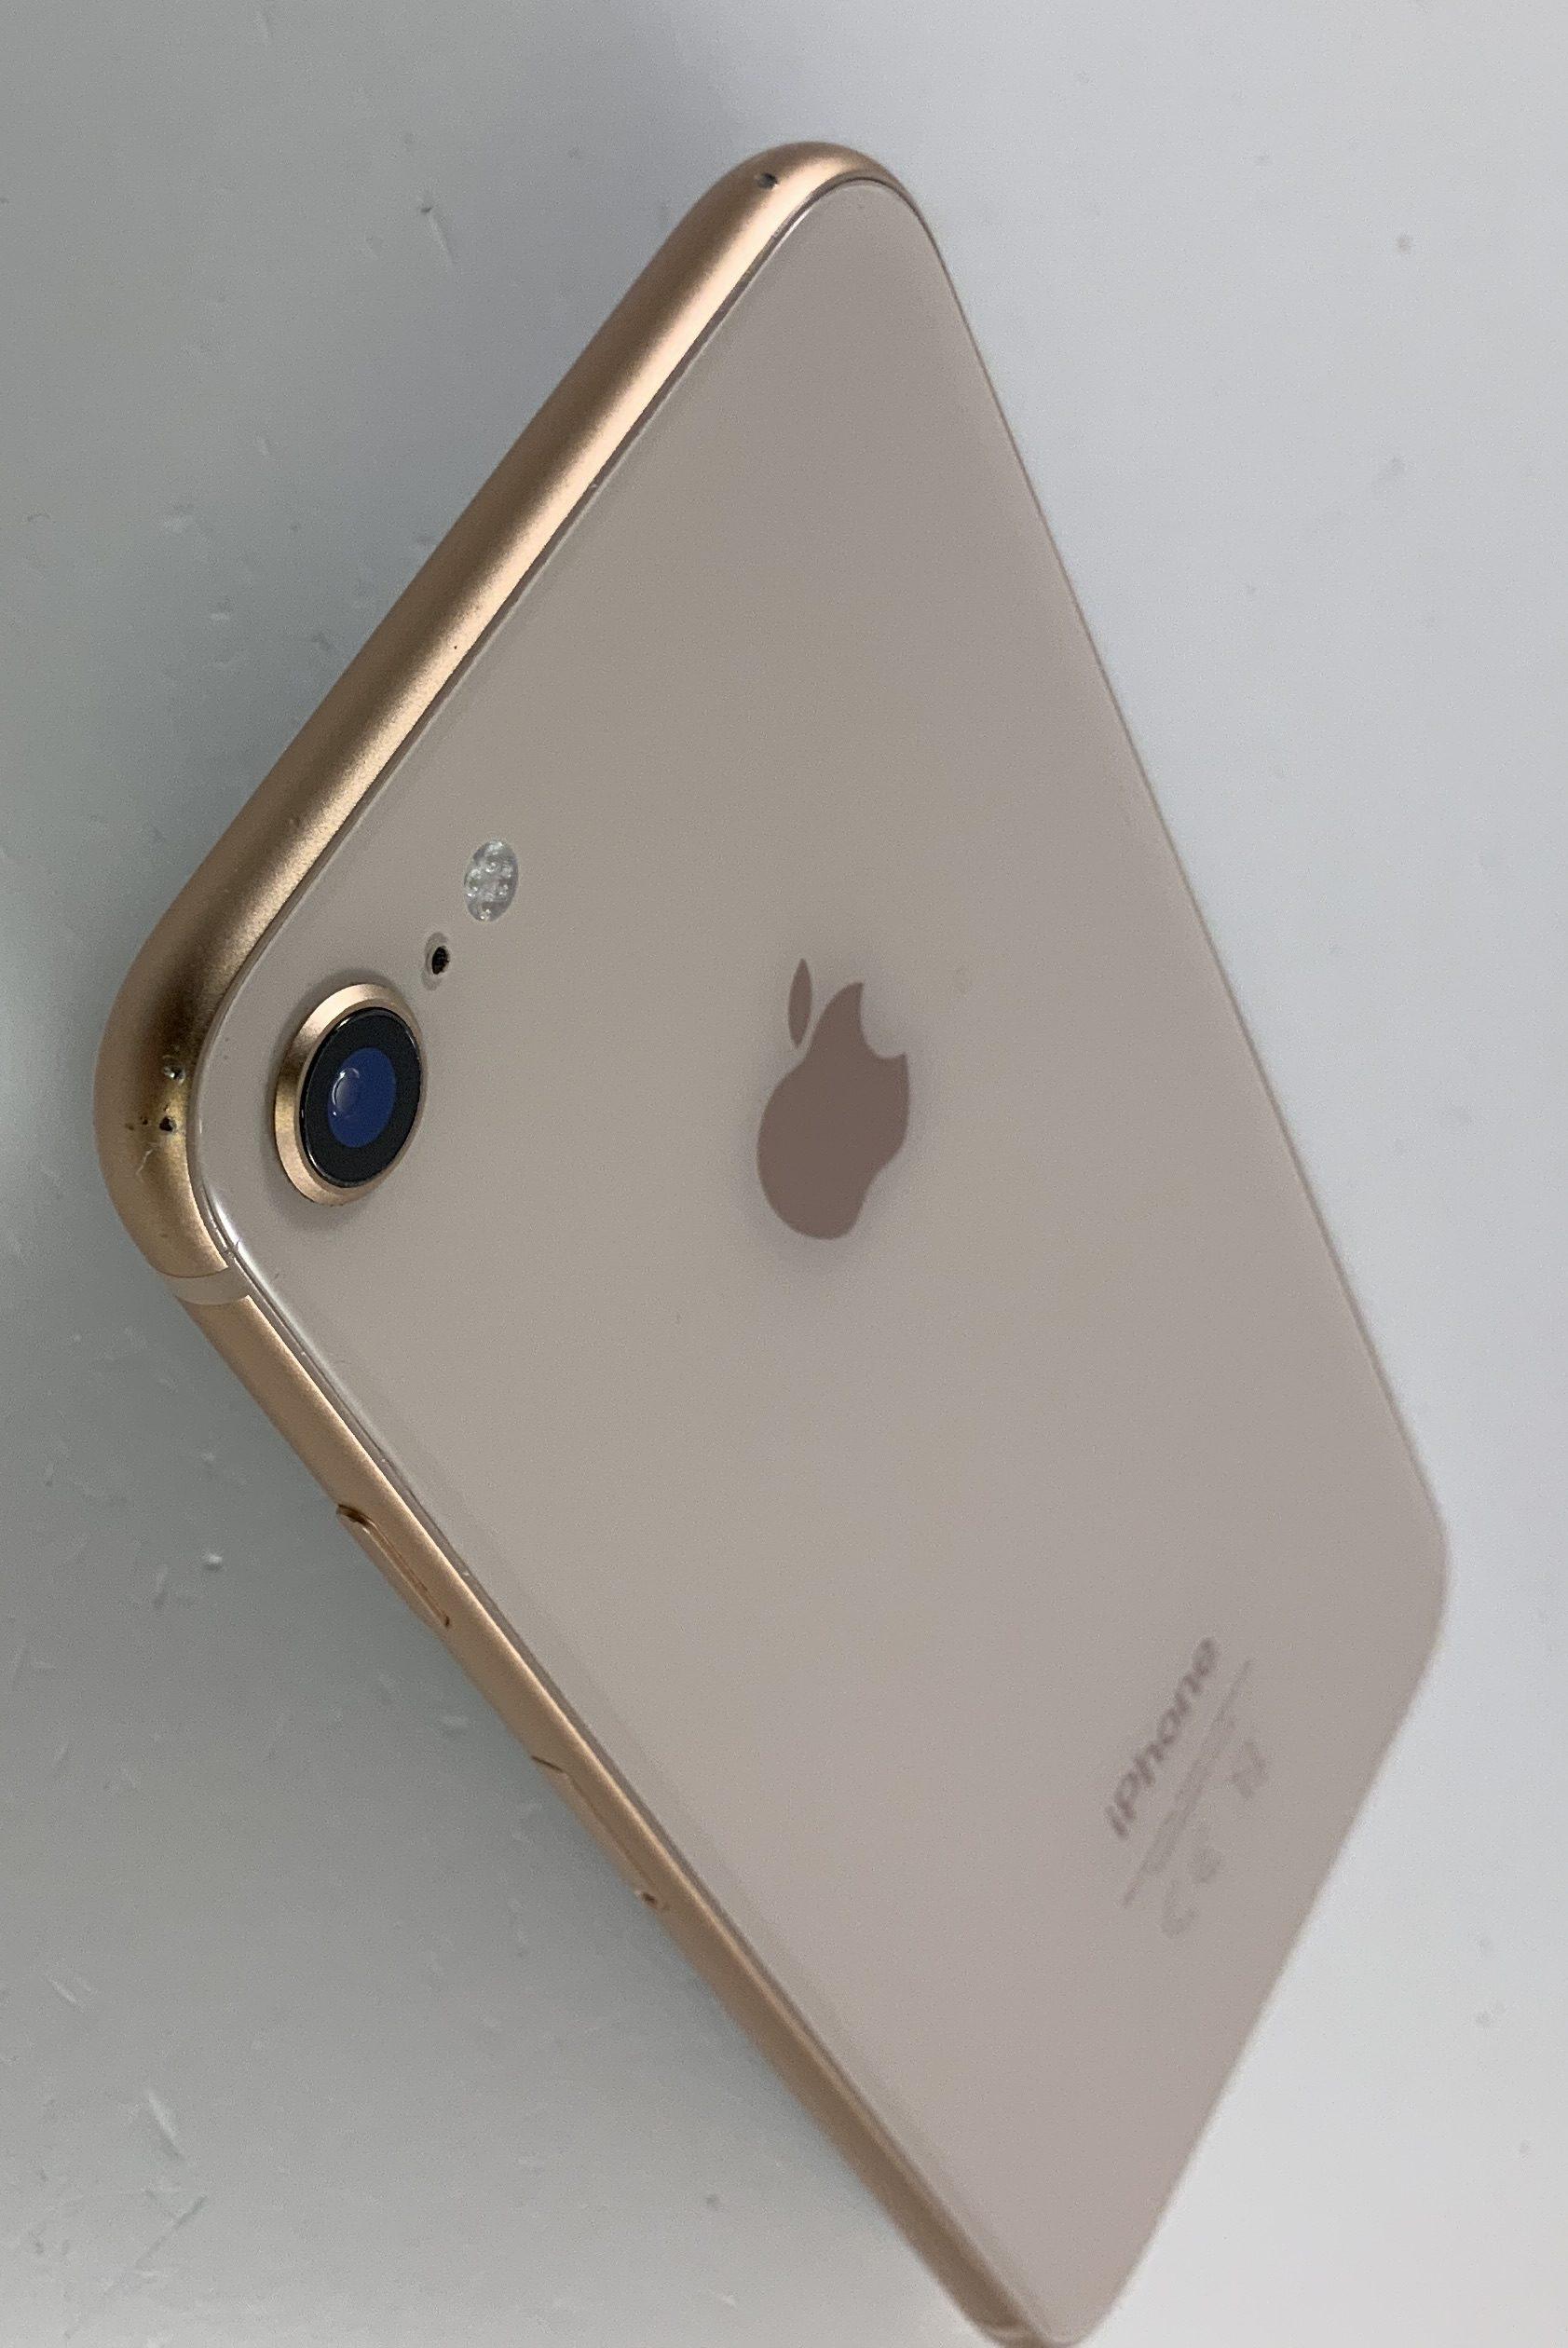 iPhone 8 64GB, 64GB, Gold, obraz 4